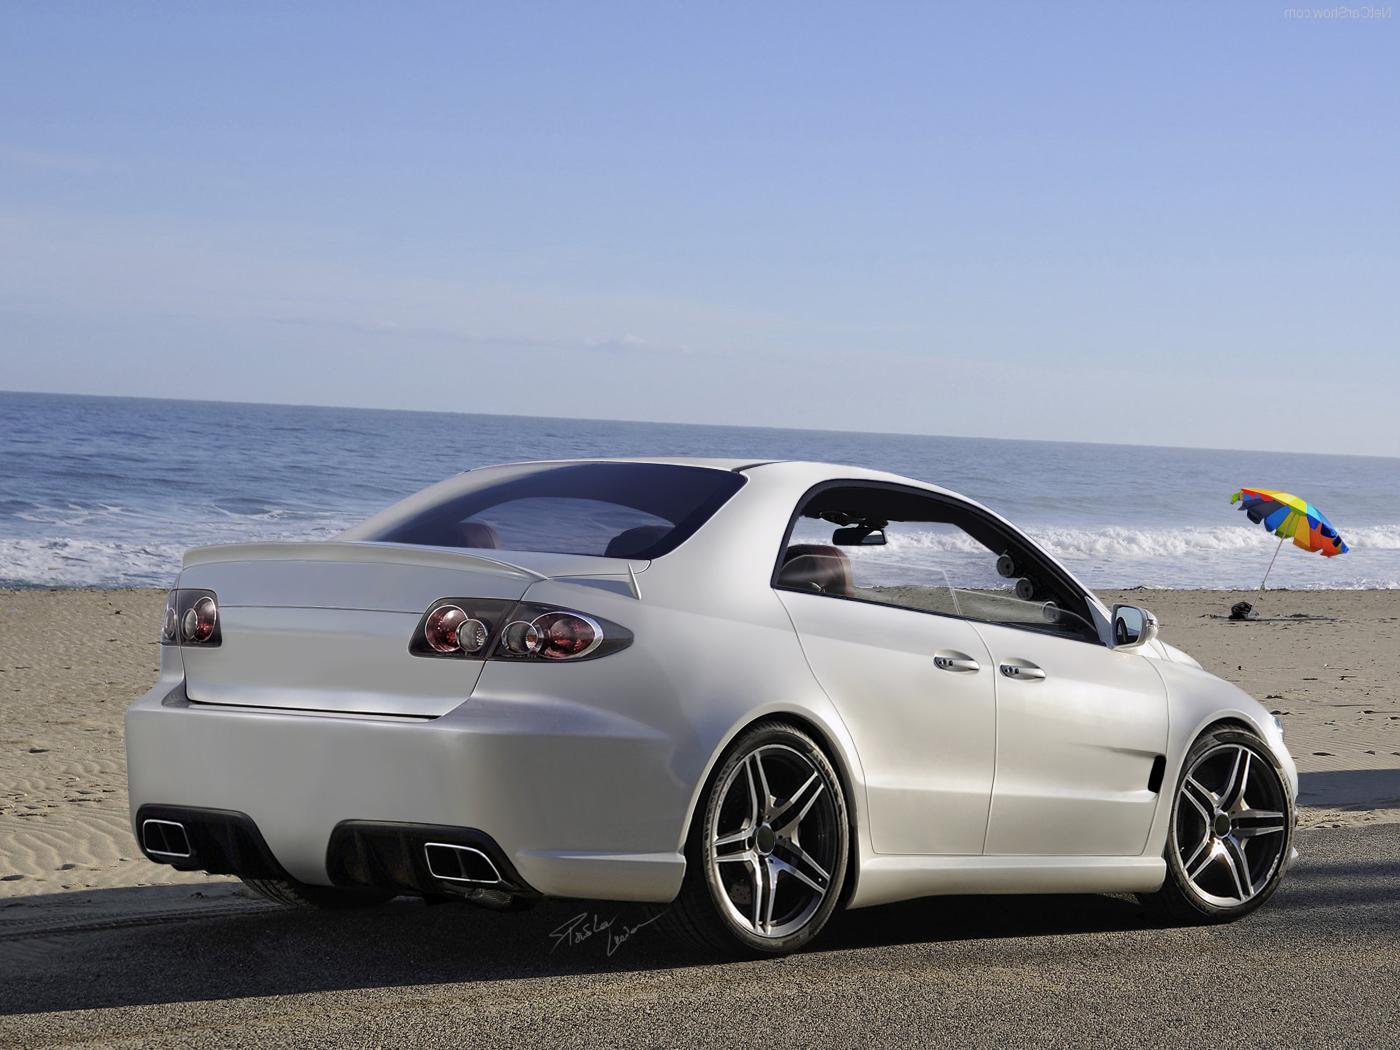 Mazda 2004 mazda 6 specs : Mazda 6 Mps Specs - Auto cars